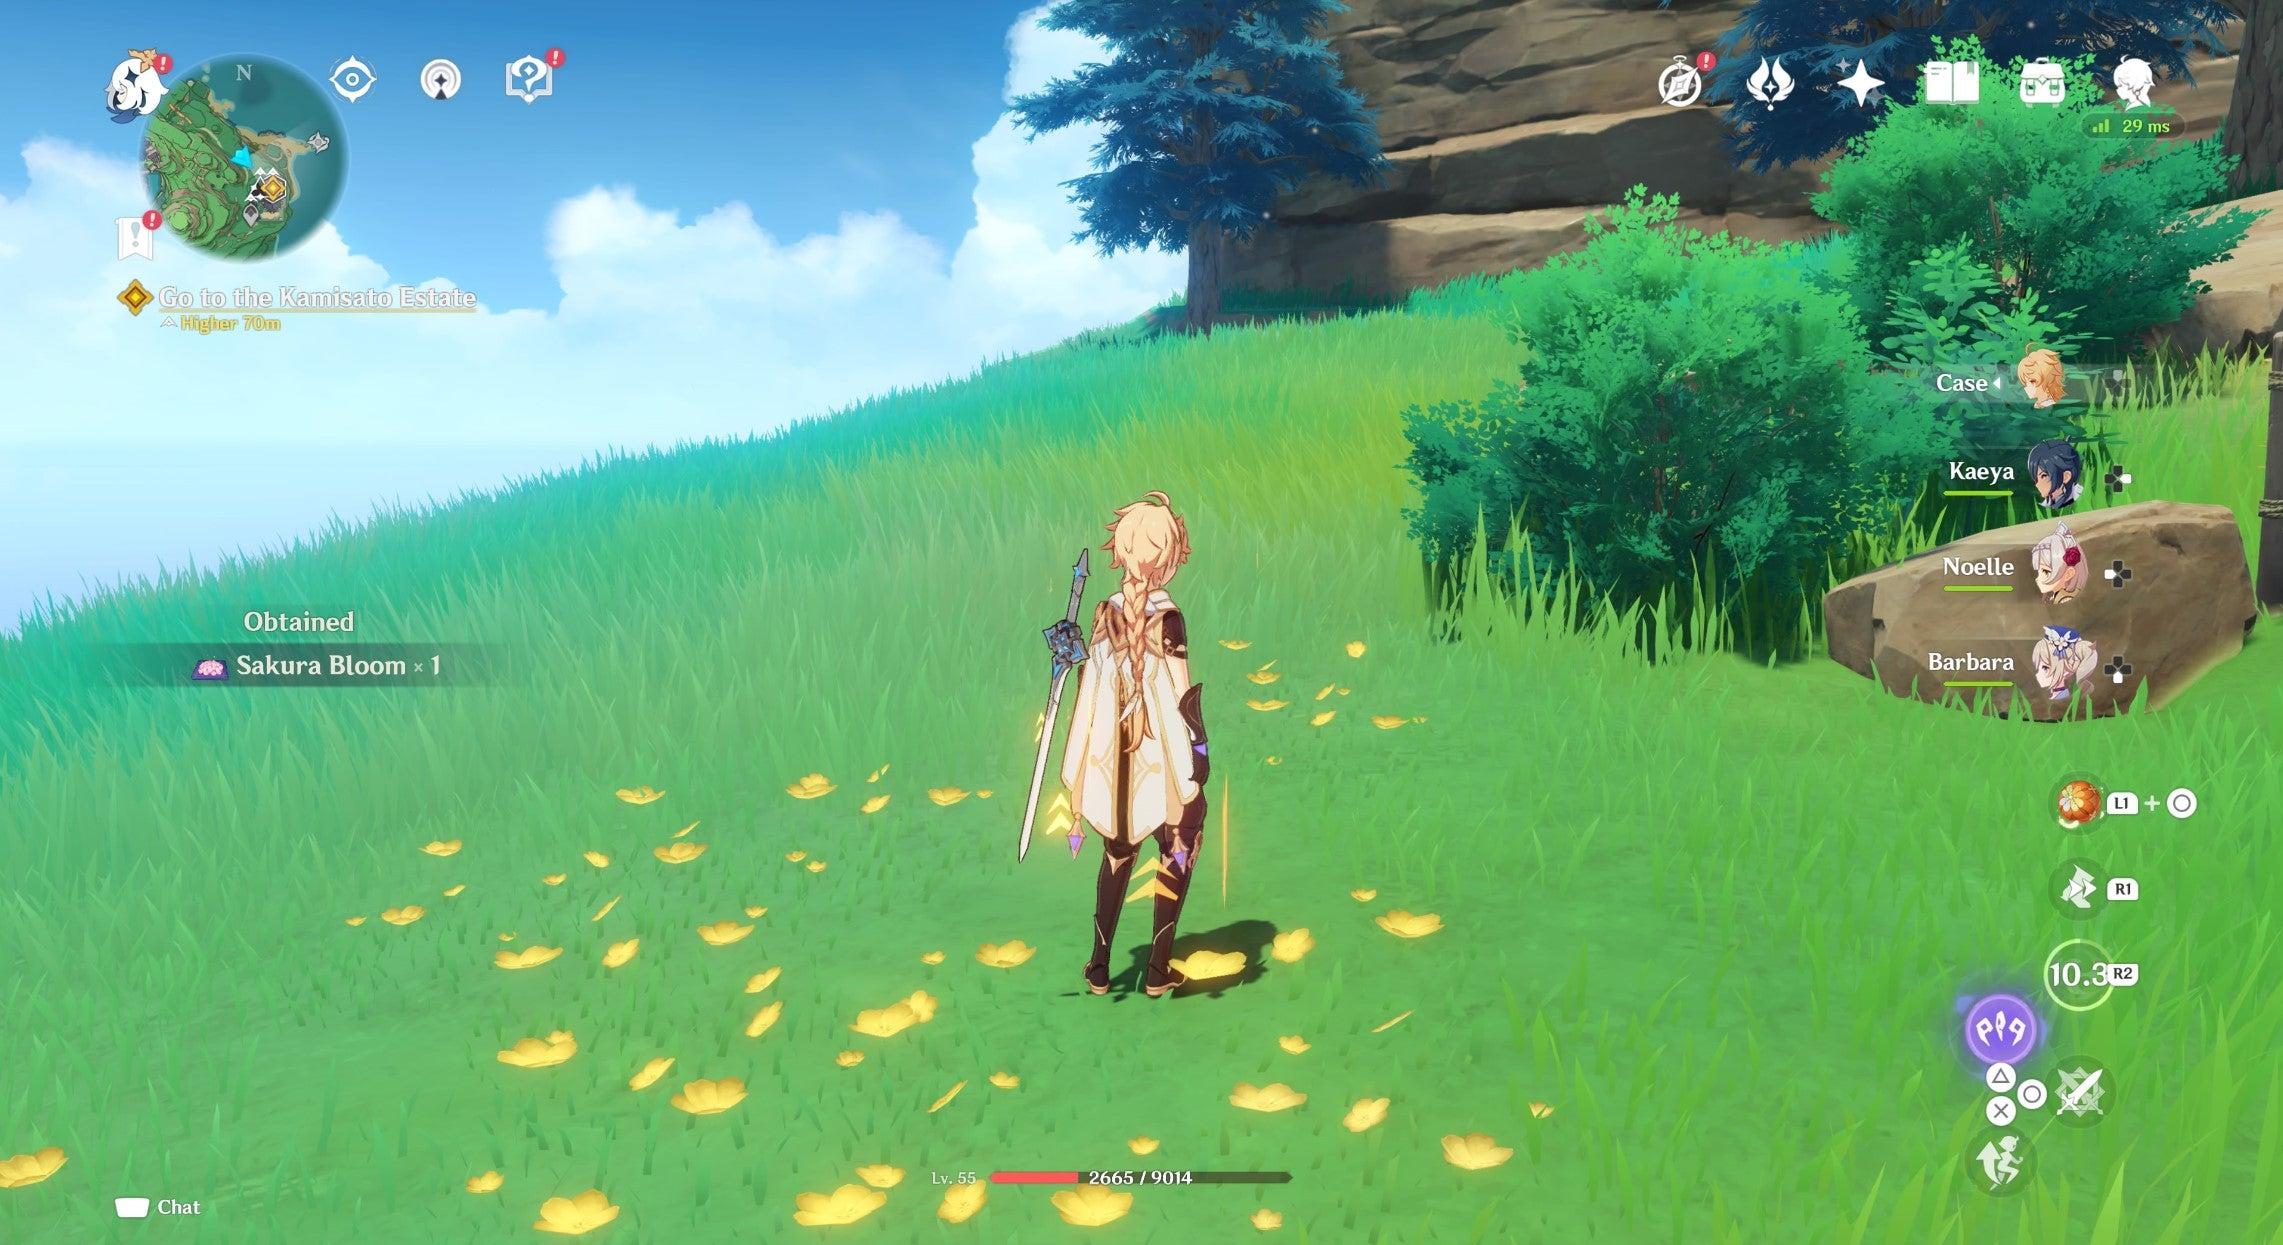 Image for Genshin Impact Sakura bloom location: How to farm Sakura Bloom